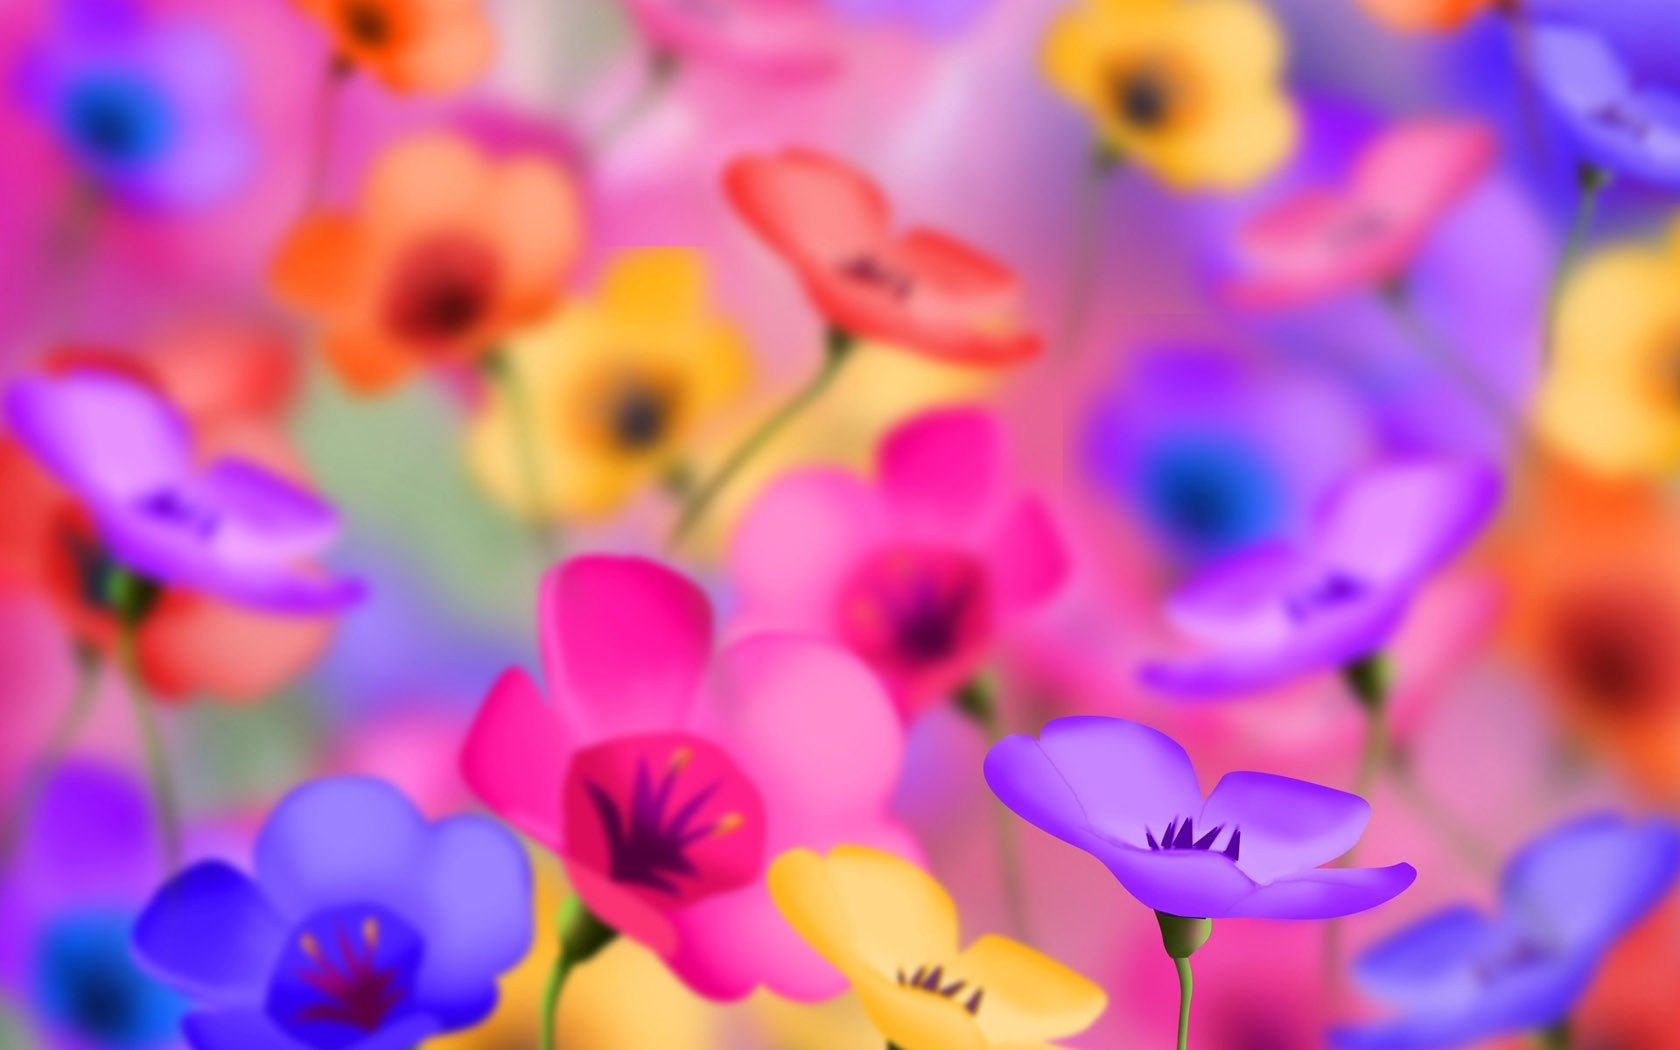 Flower Flowers Wallpaper 1729 Wallbase Cc Amazing Flowers Pretty Flowers Colorful Flowers